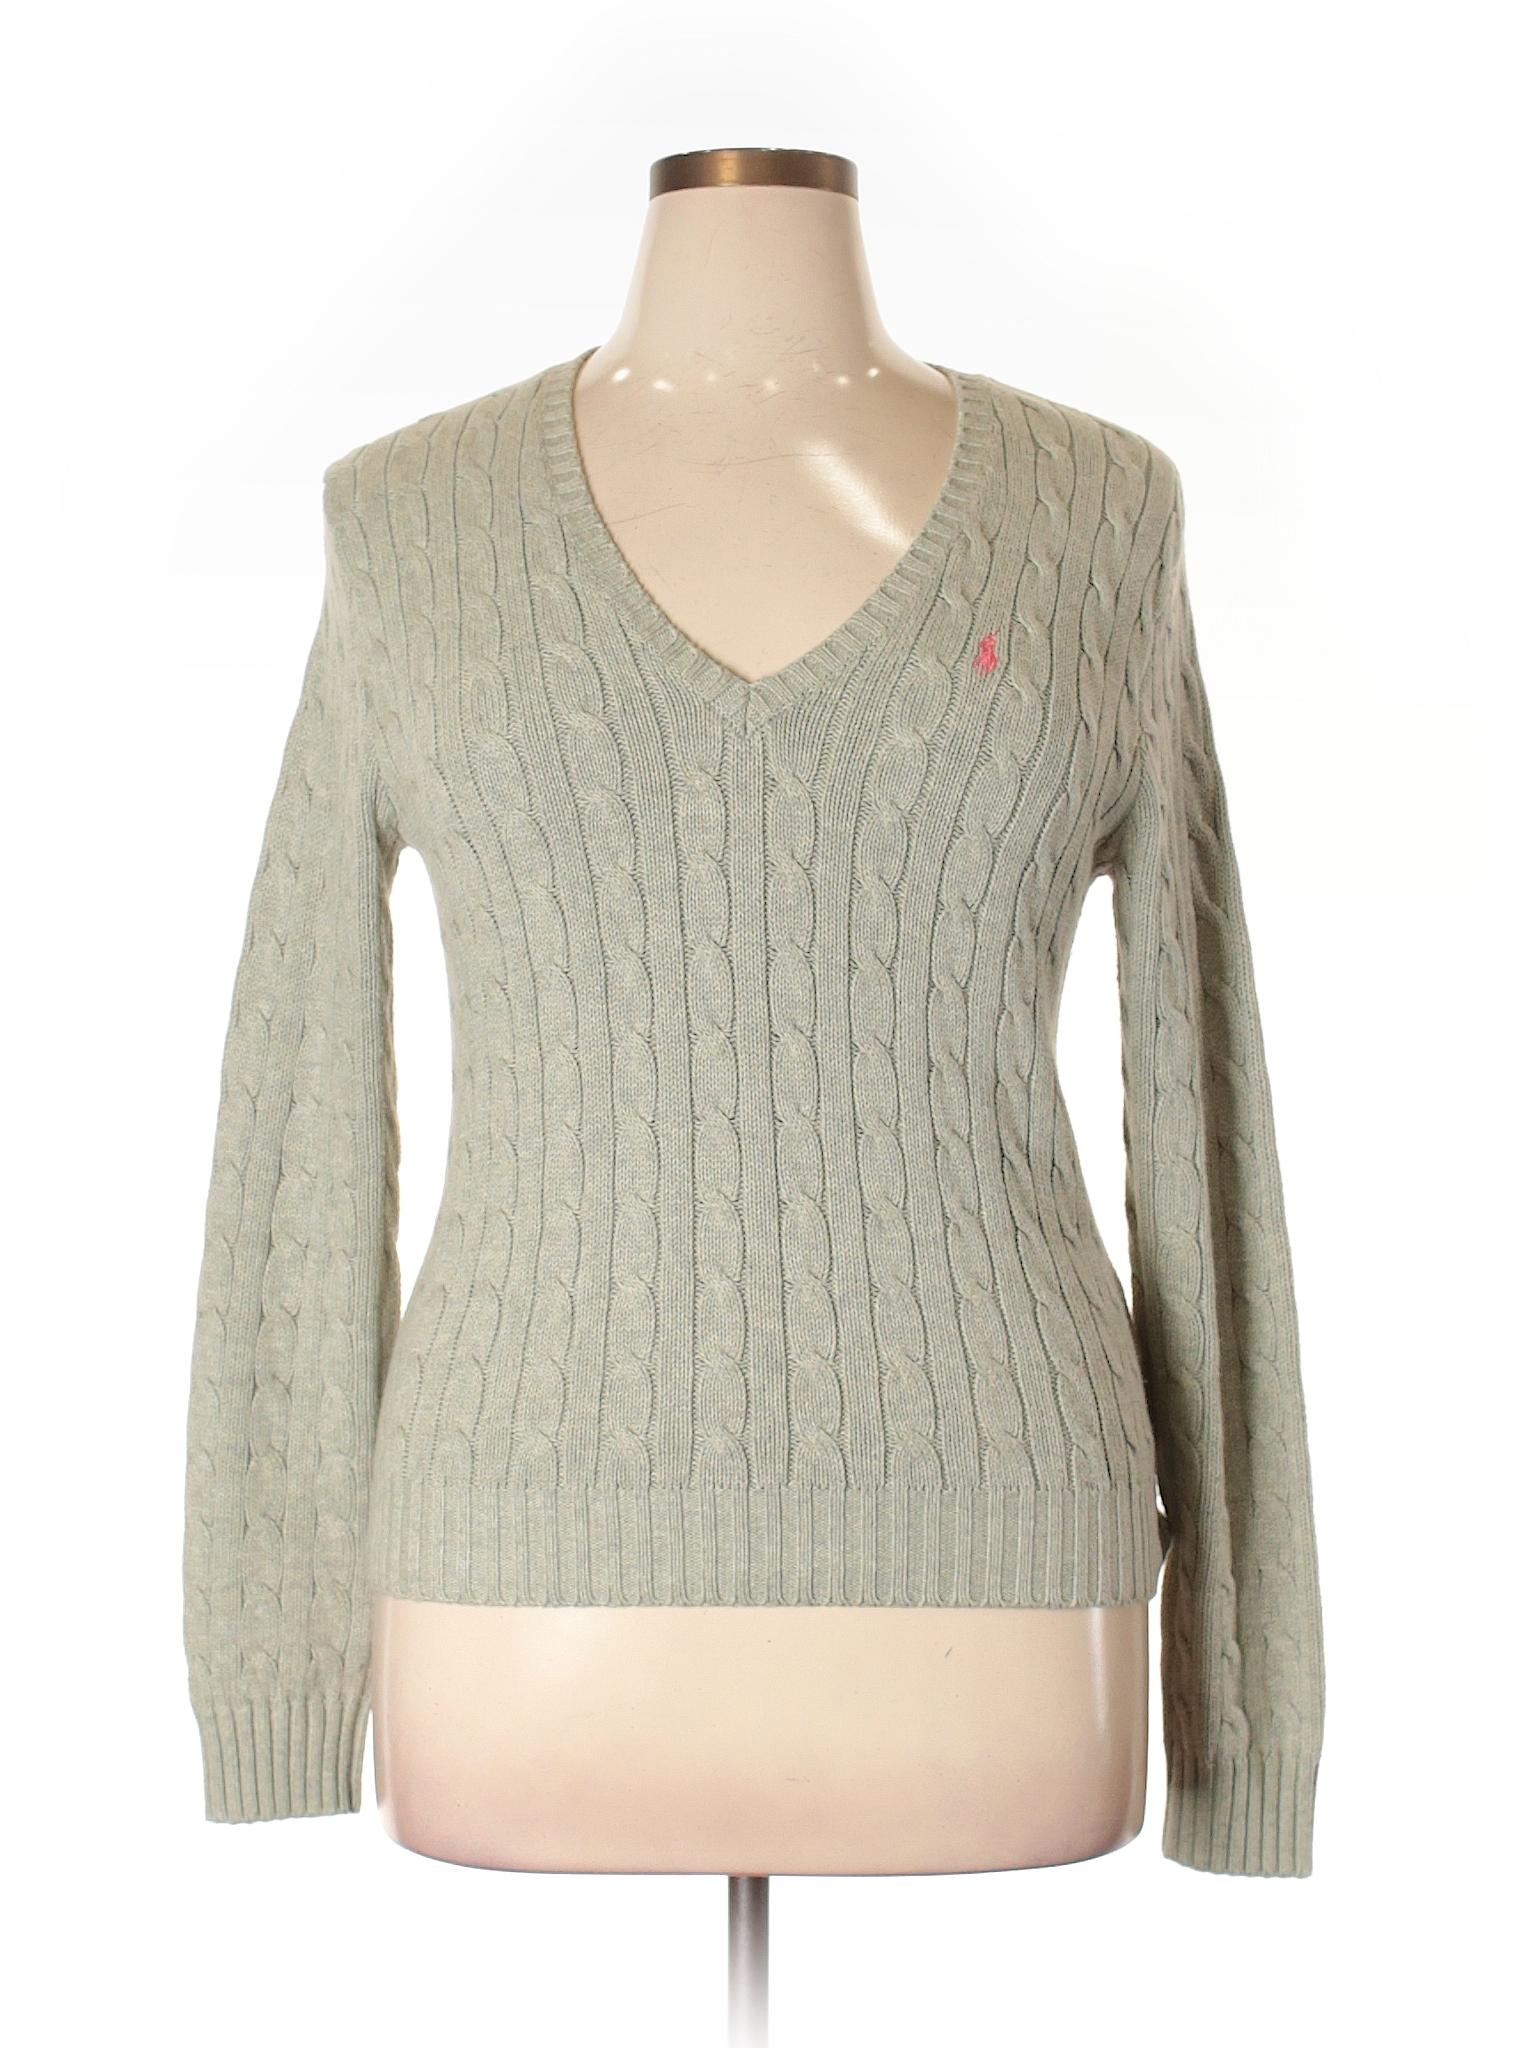 Pullover Boutique Sweater Lauren Sport Ralph tOr1w78nxO